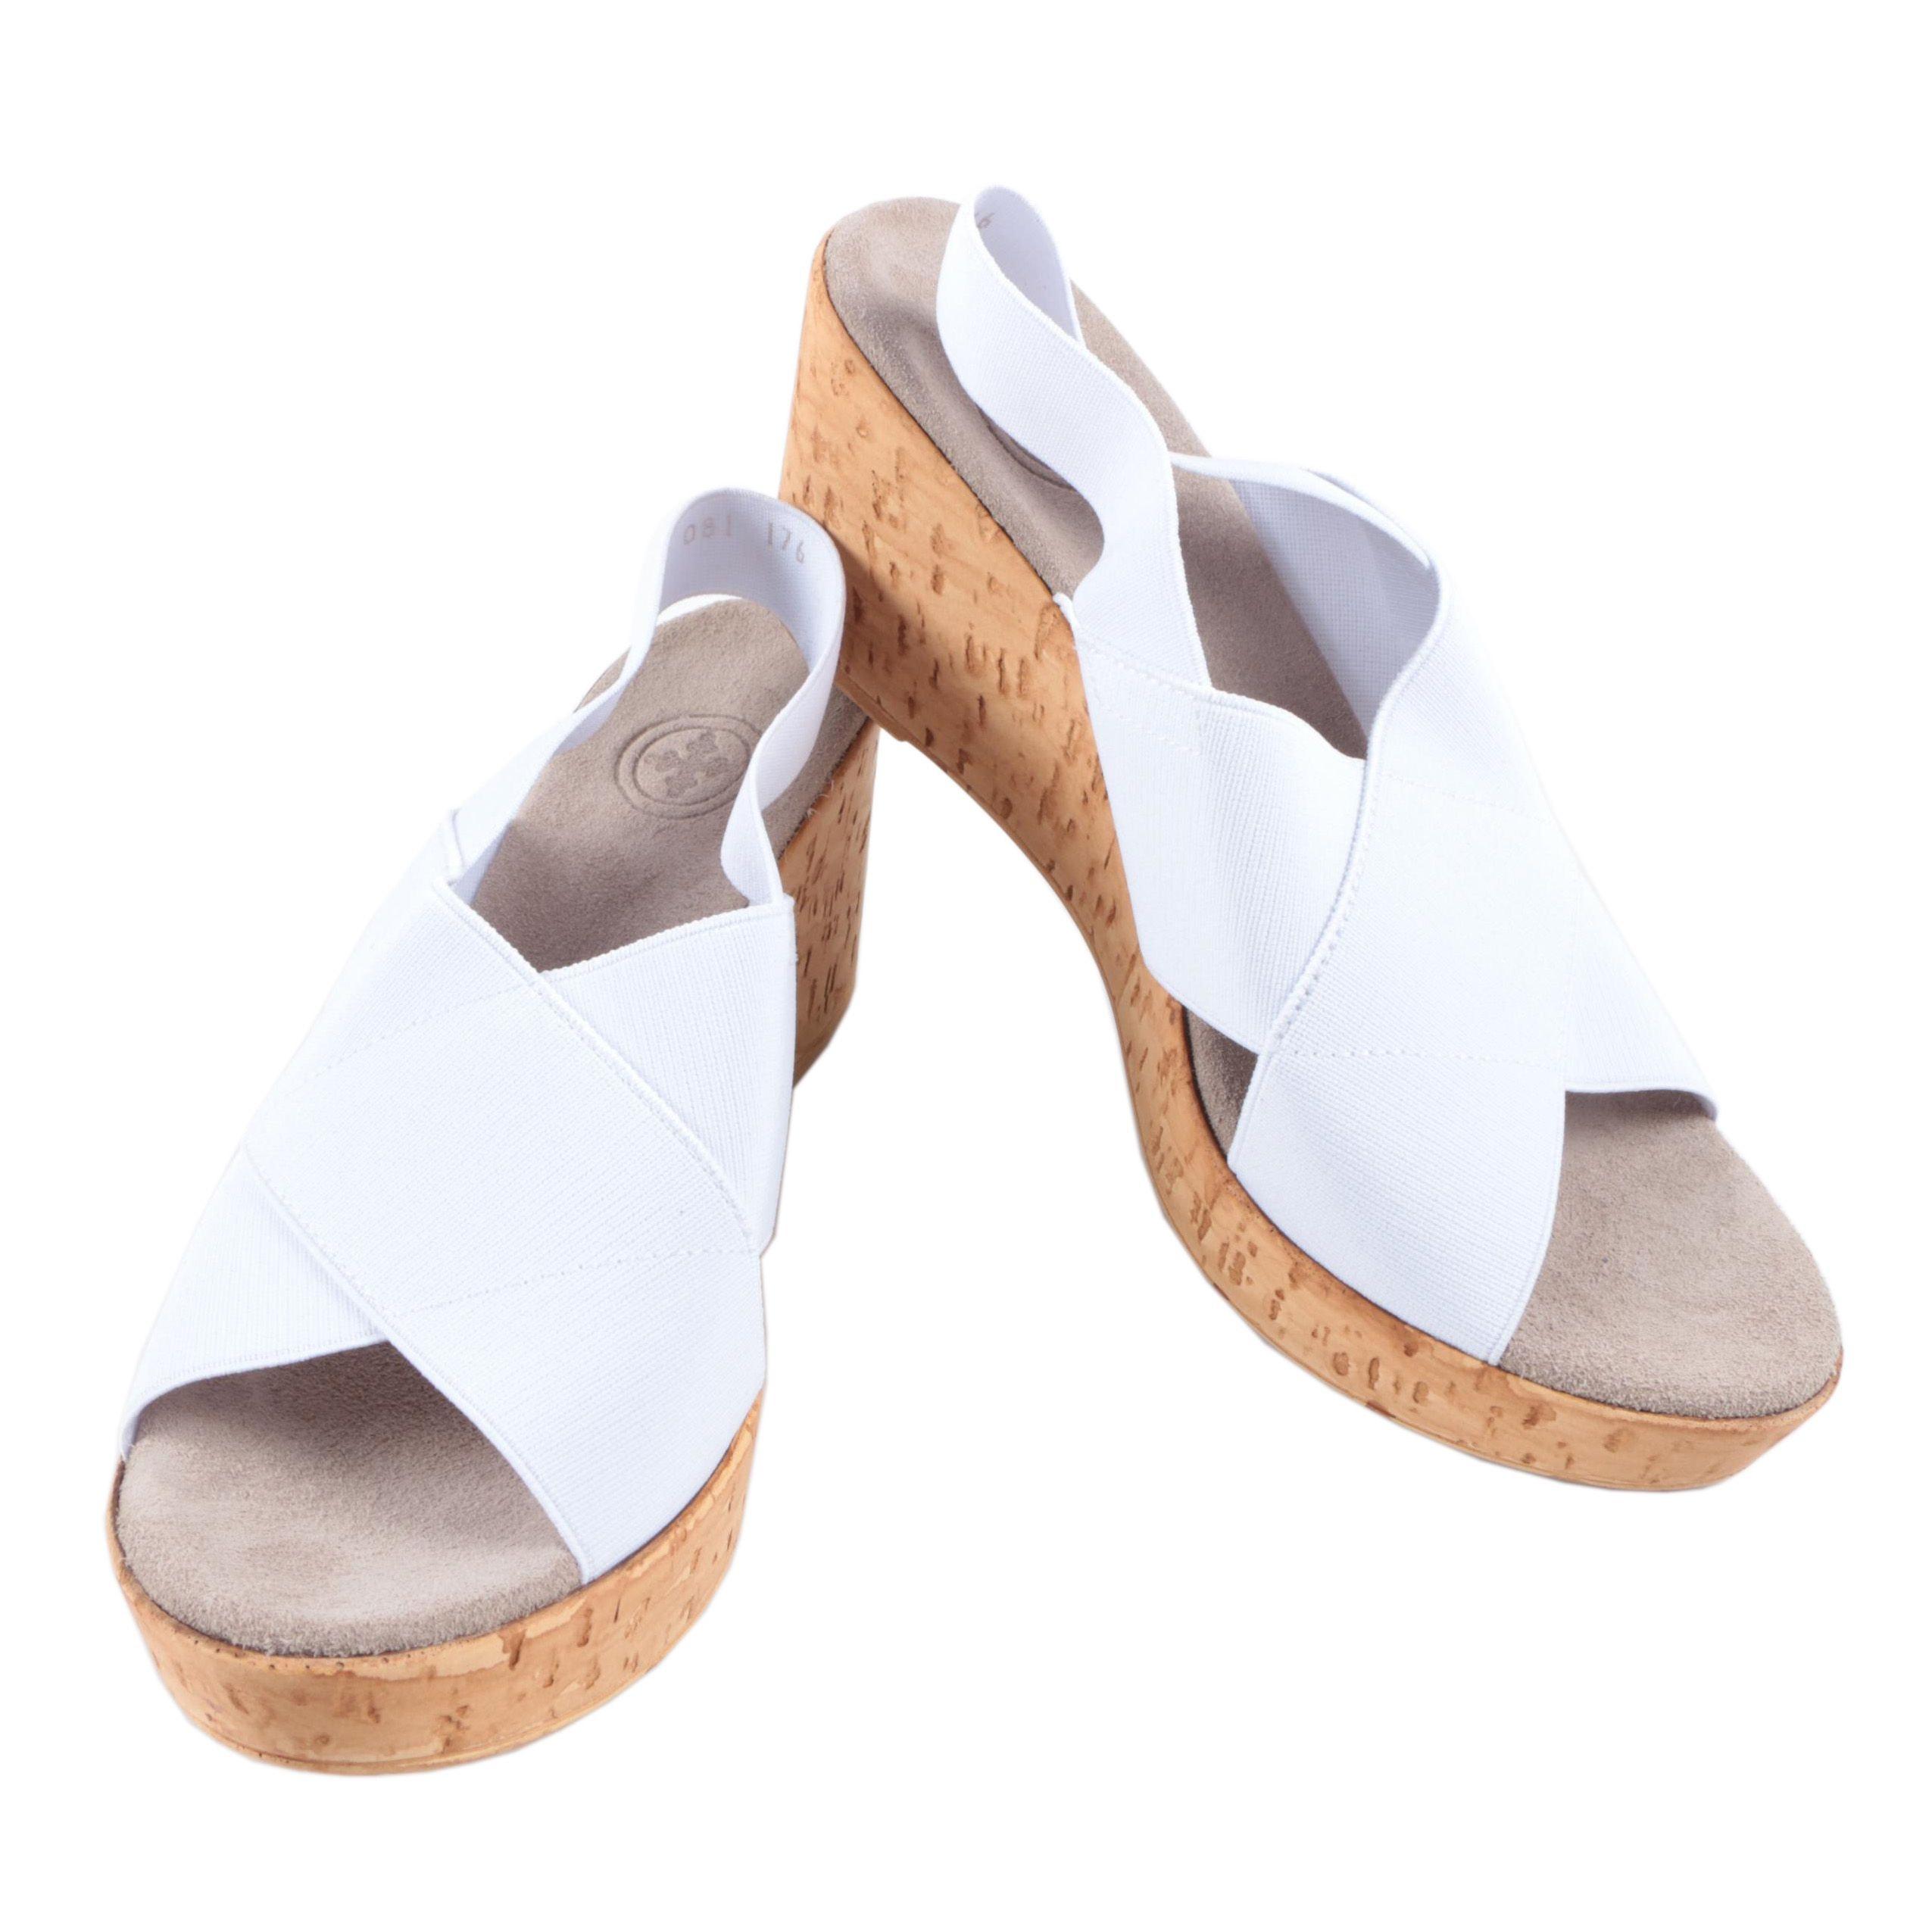 Charleston Shoe Co. White Cork Wedge Sandals